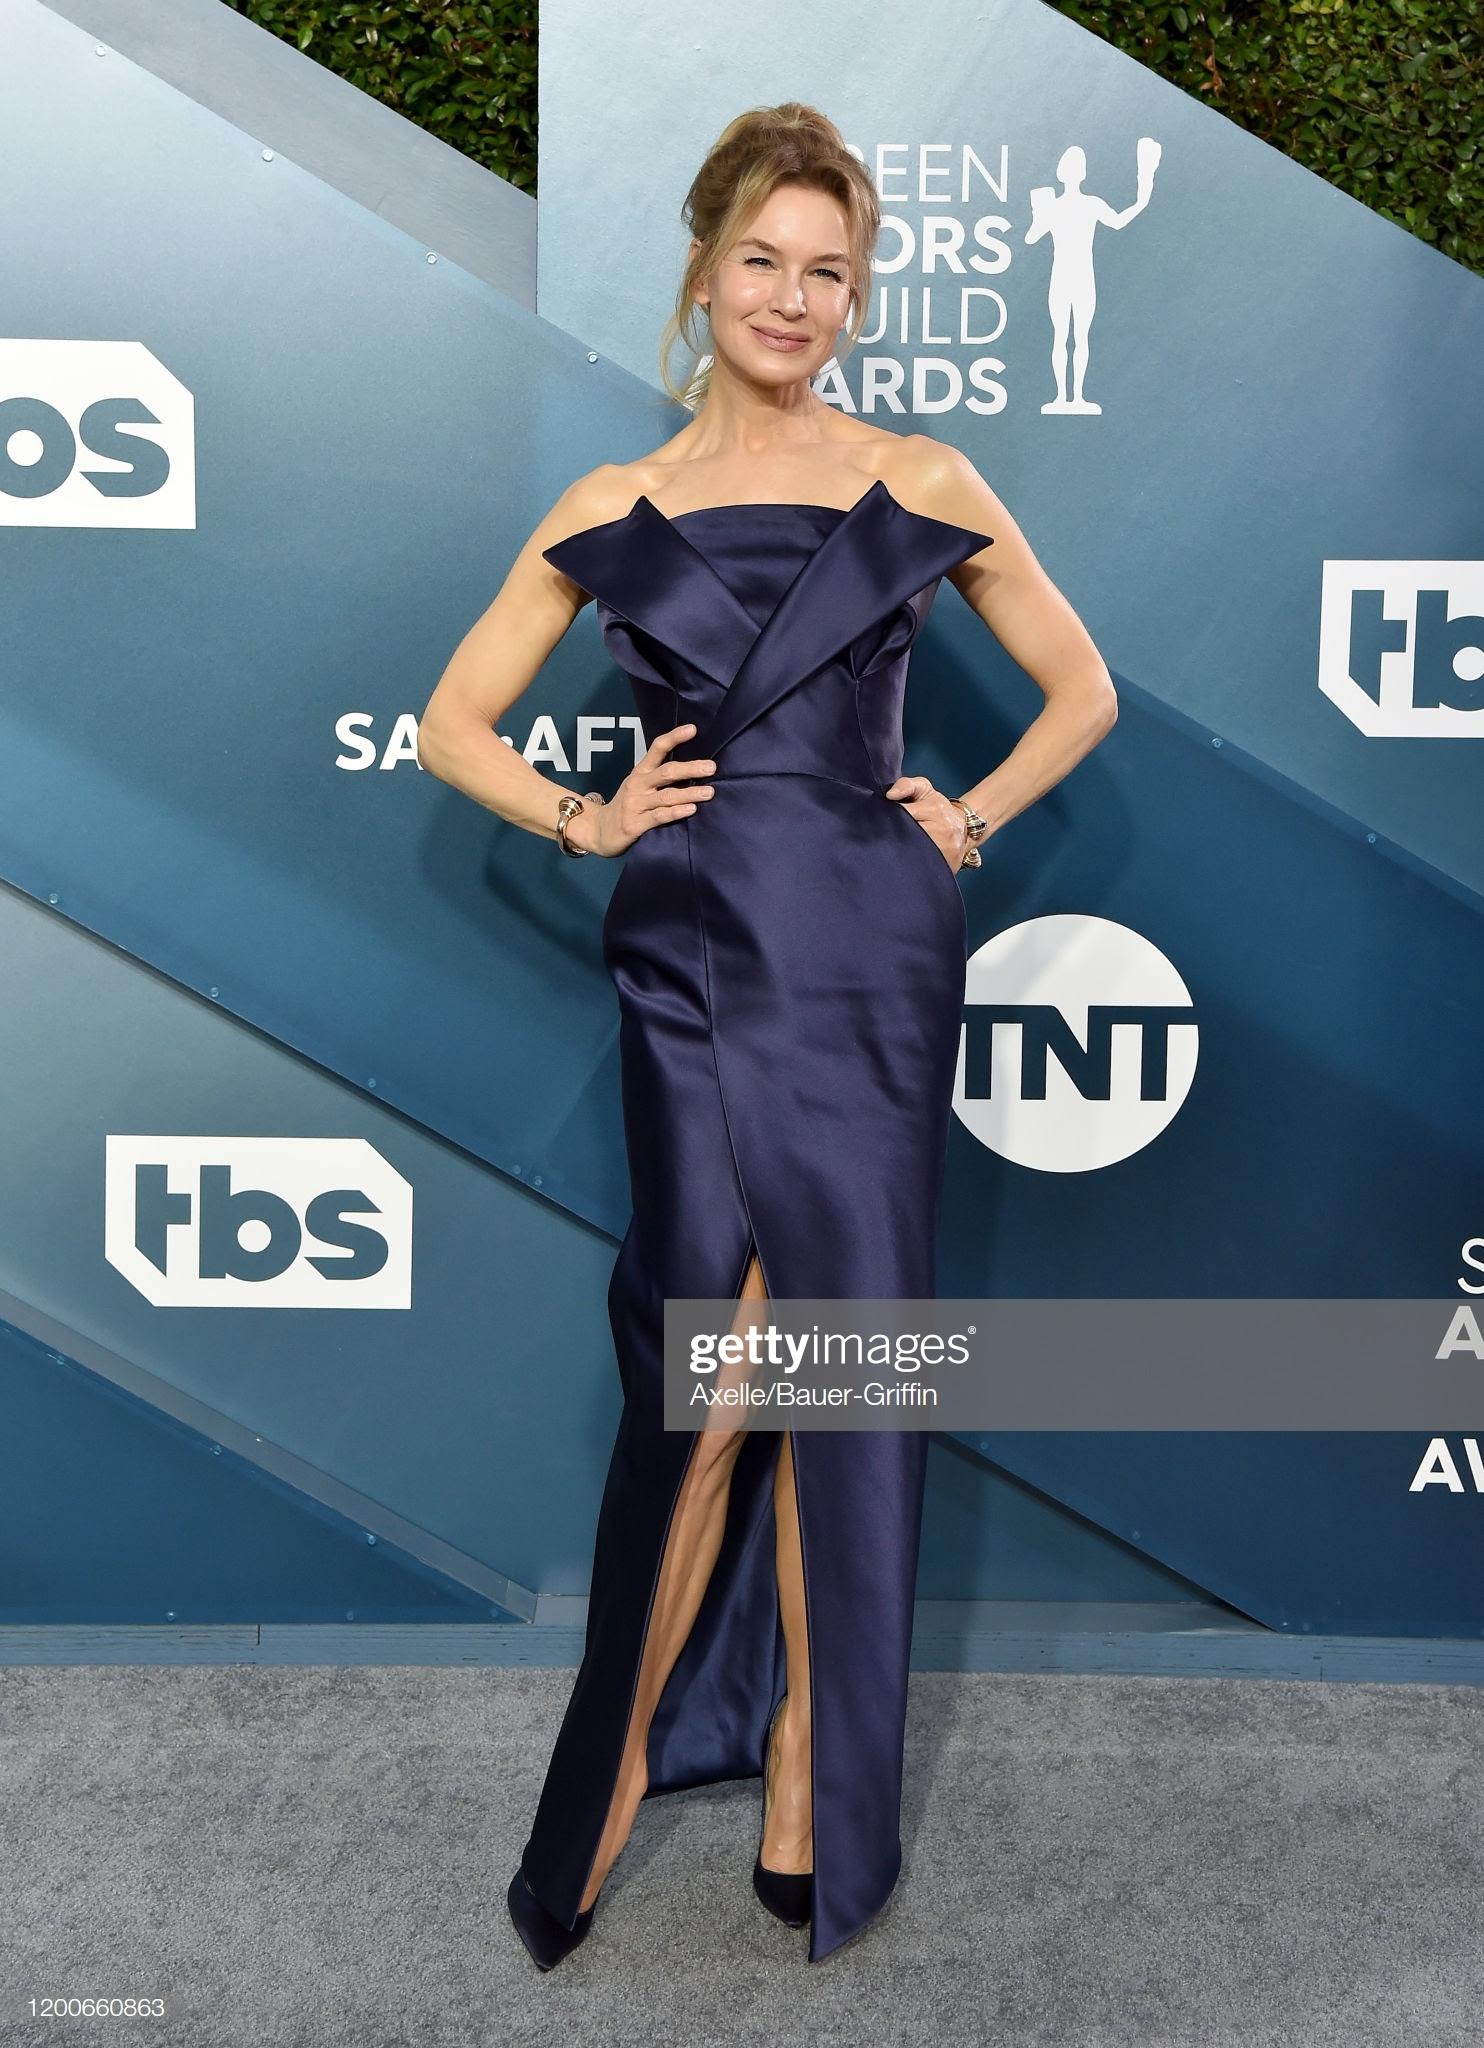 "38e0133e dca4 40a5 989e c1cd1fdd46a2 - Screen Actors Guild Awards"" 2020: Scarlett Johansson y Leonardo Dicaprio entre las celebrities que lucieron Jimmy Choo"